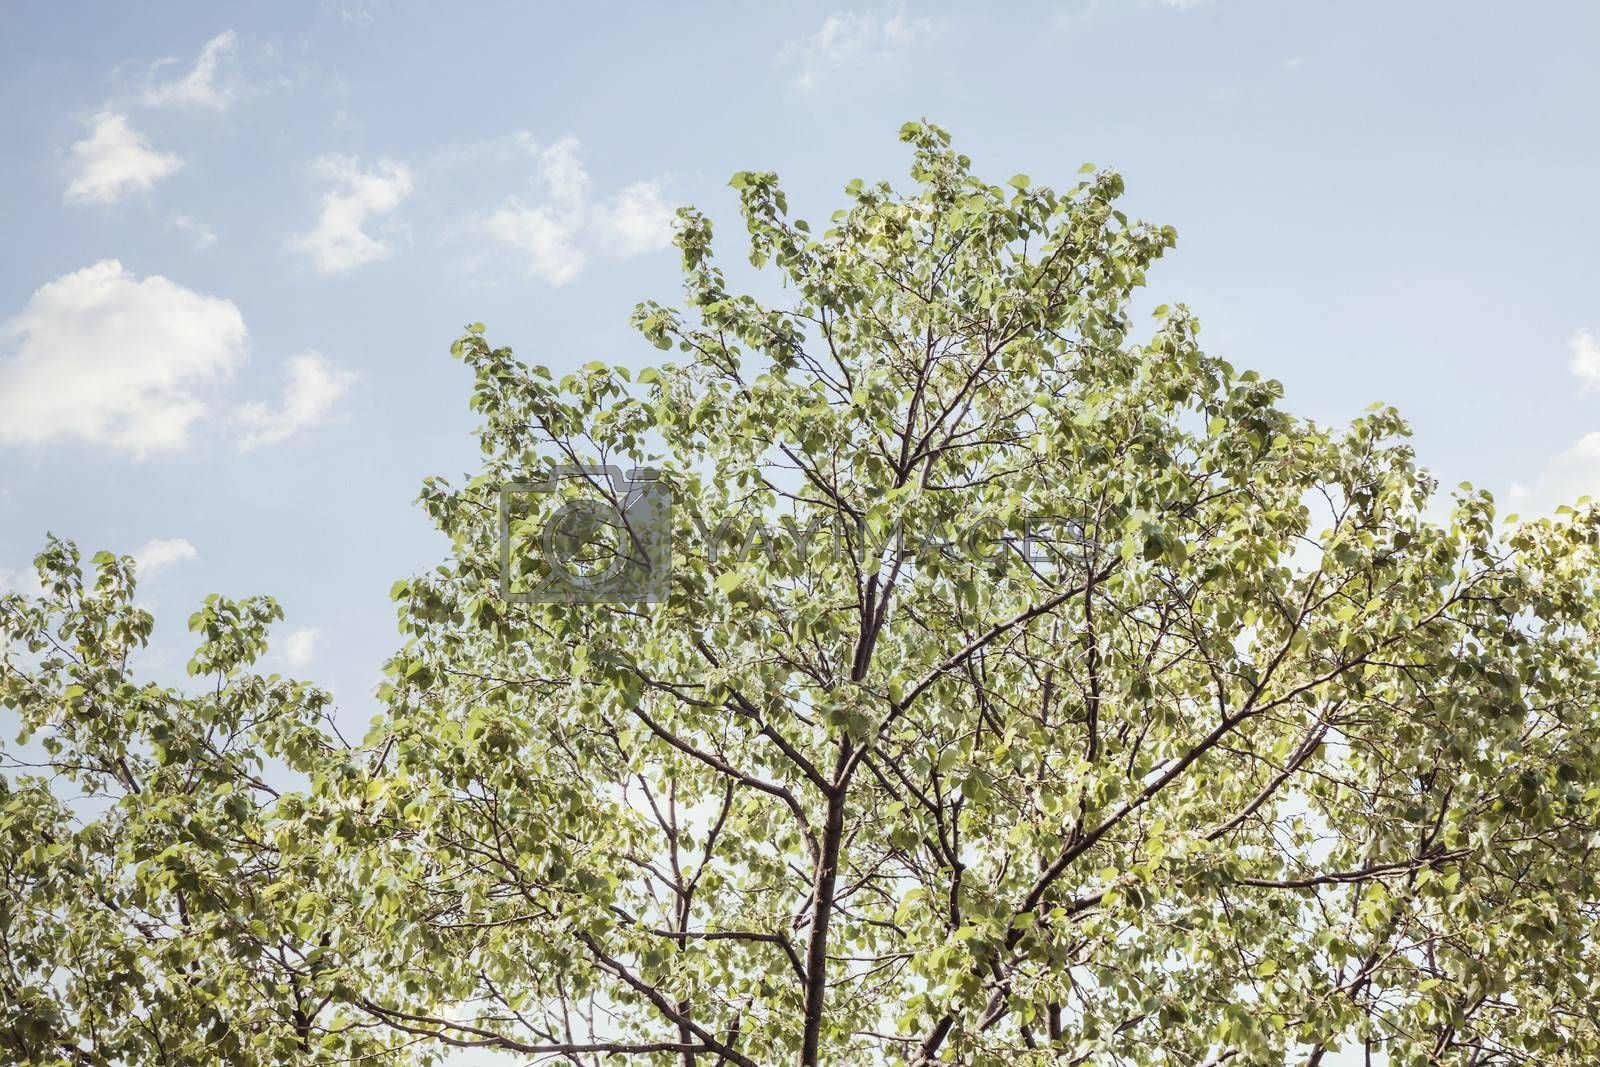 Tree tops against blue sky.